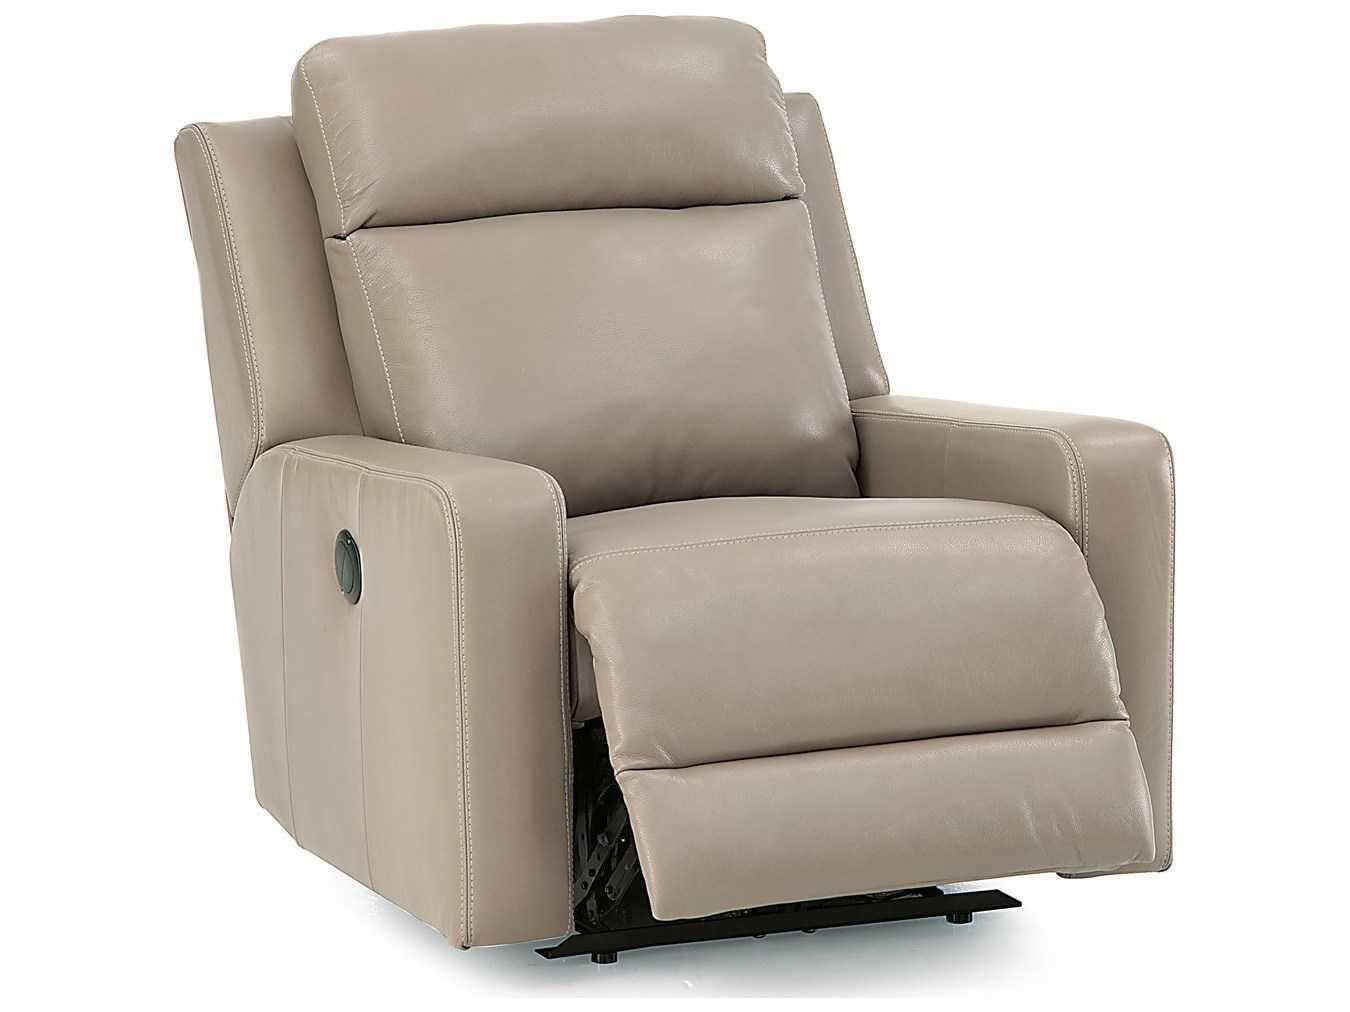 Palliser Forest Hill Swivel Rocker Recliner Chair Swivel Rocker